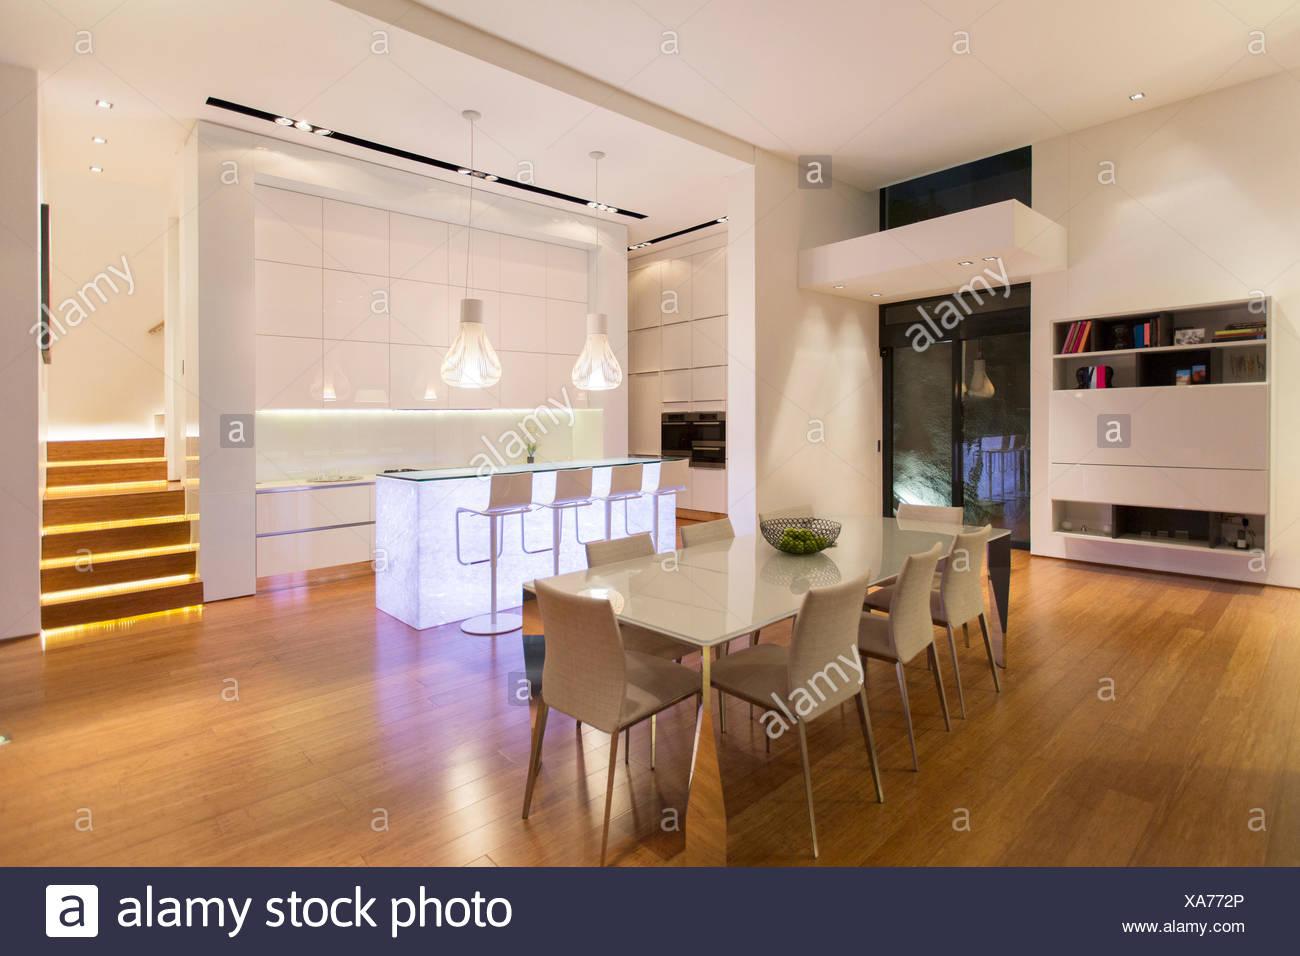 Zona Pranzo Moderna.Zona Pranzo E Cucina In Casa Moderna Foto Immagine Stock